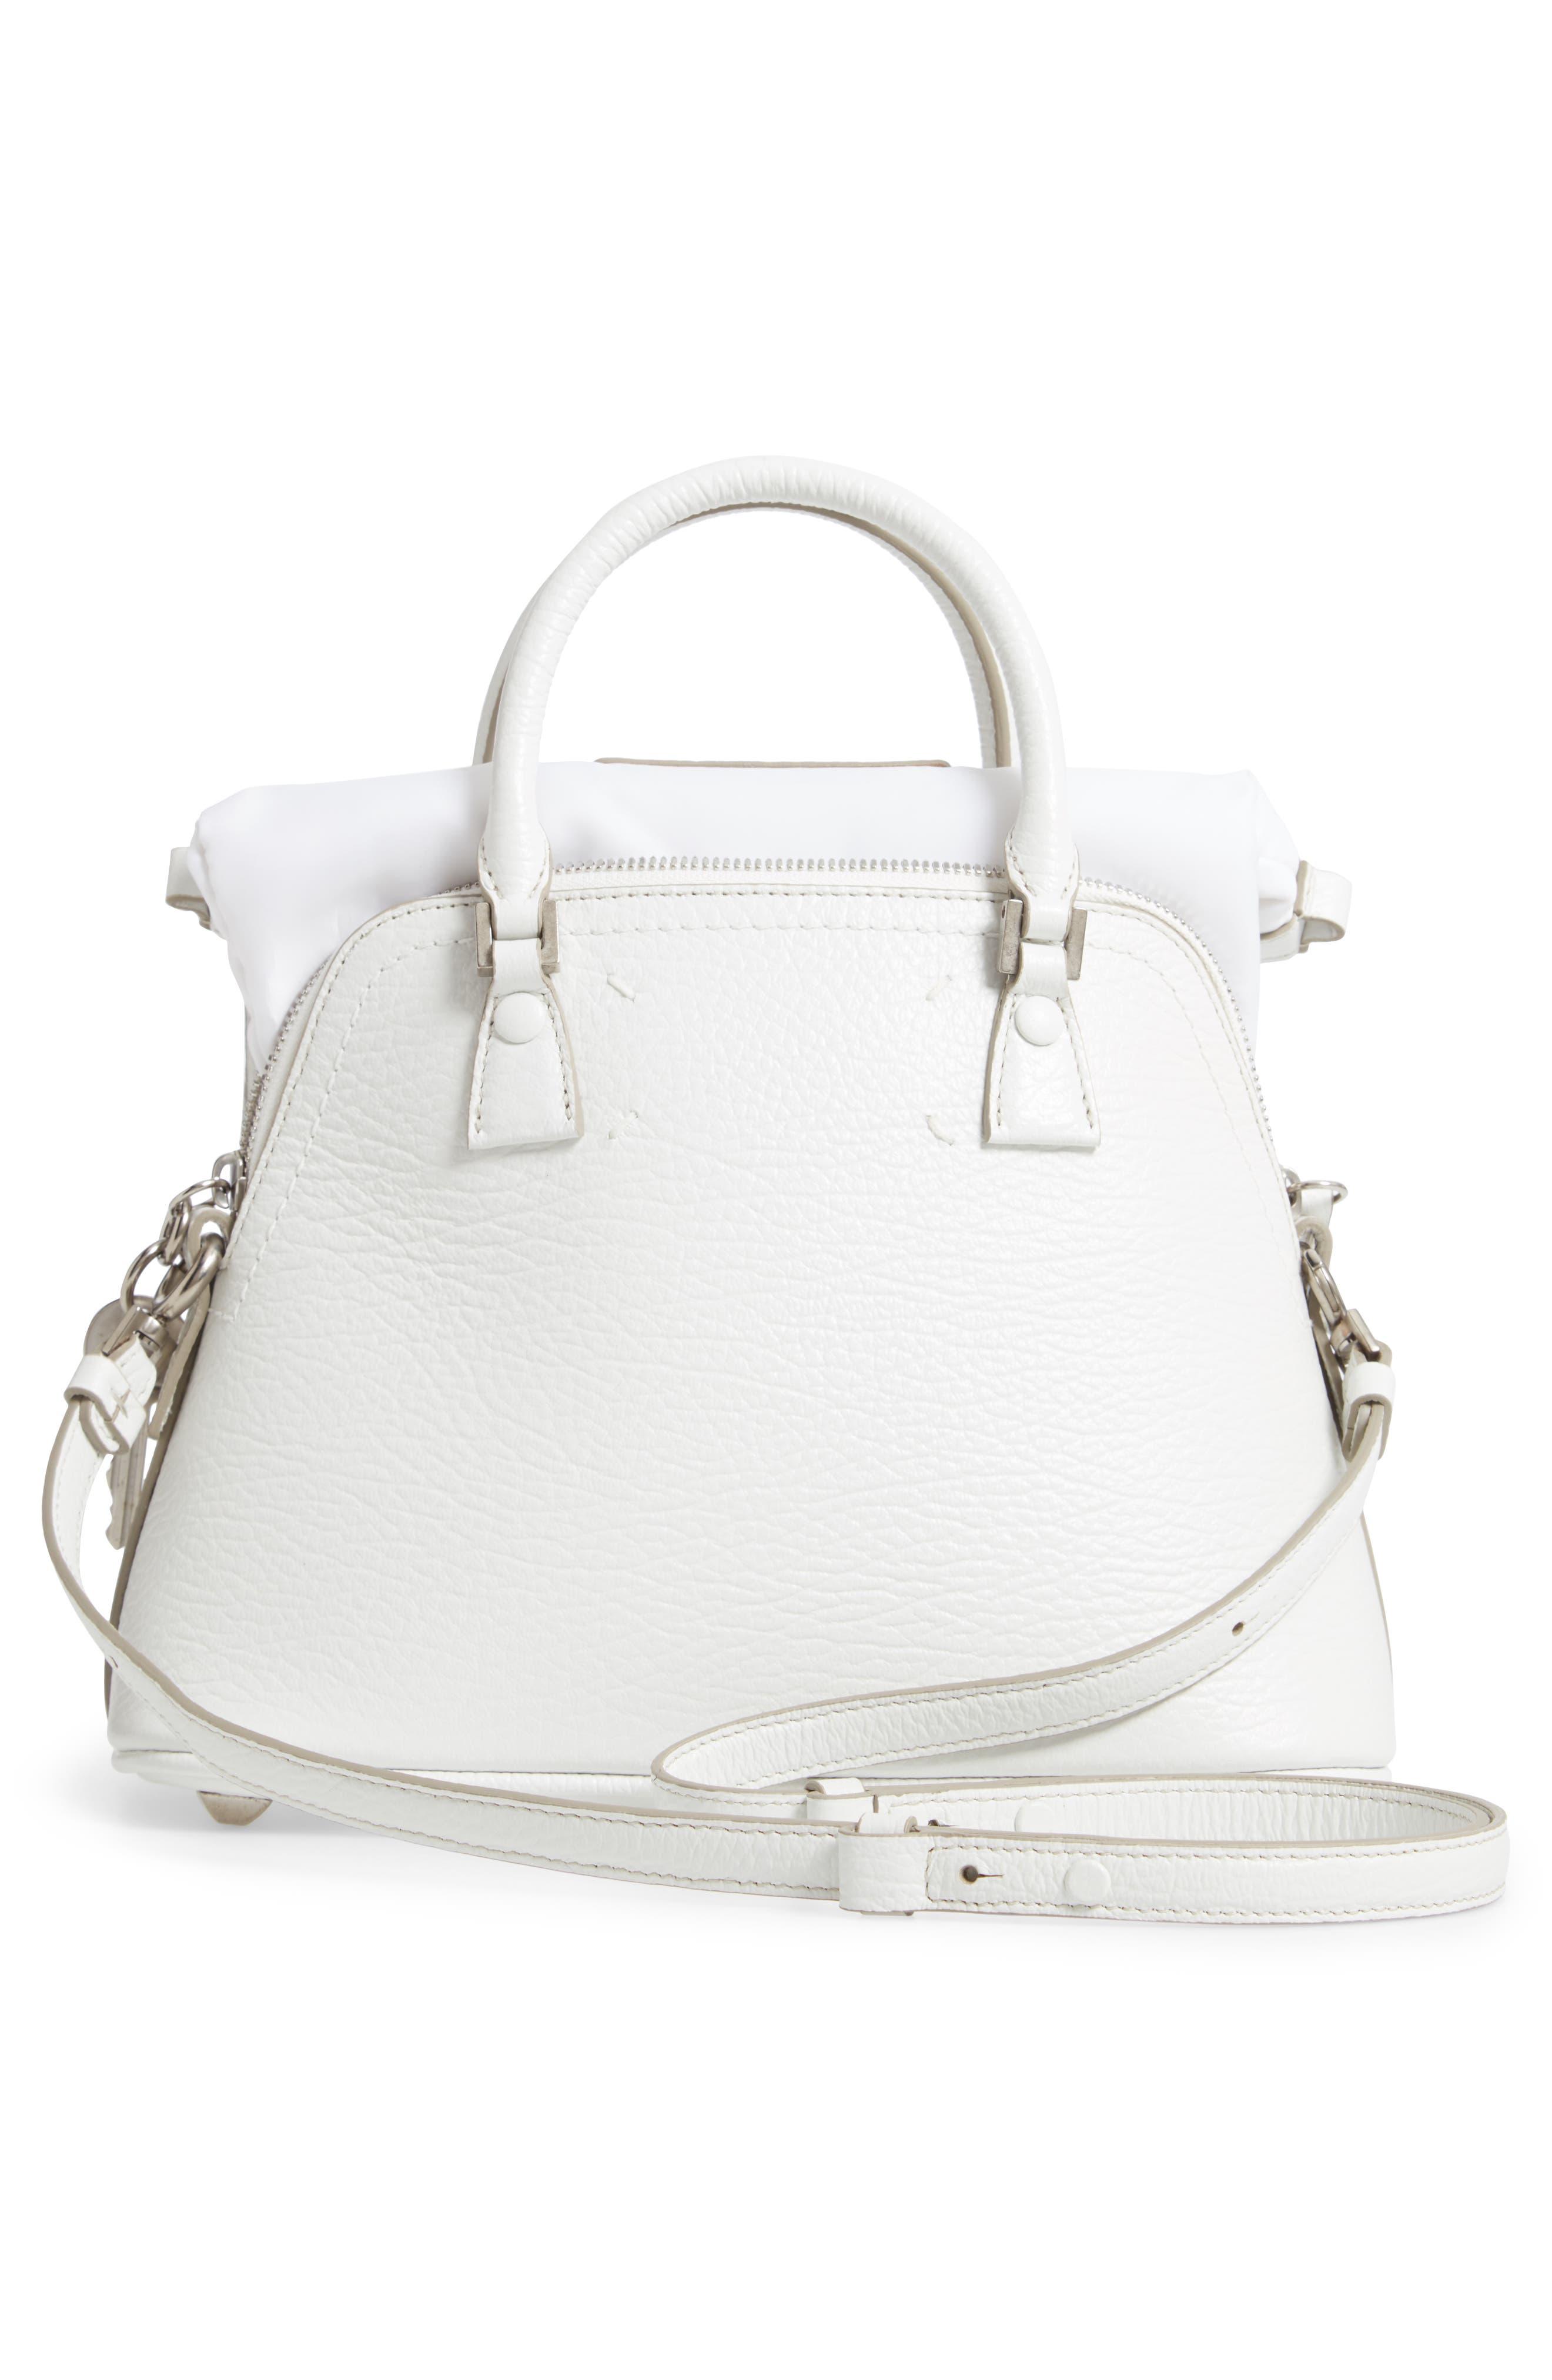 Small 5AC Calfskin Leather Handbag,                             Alternate thumbnail 4, color,                             WHITE